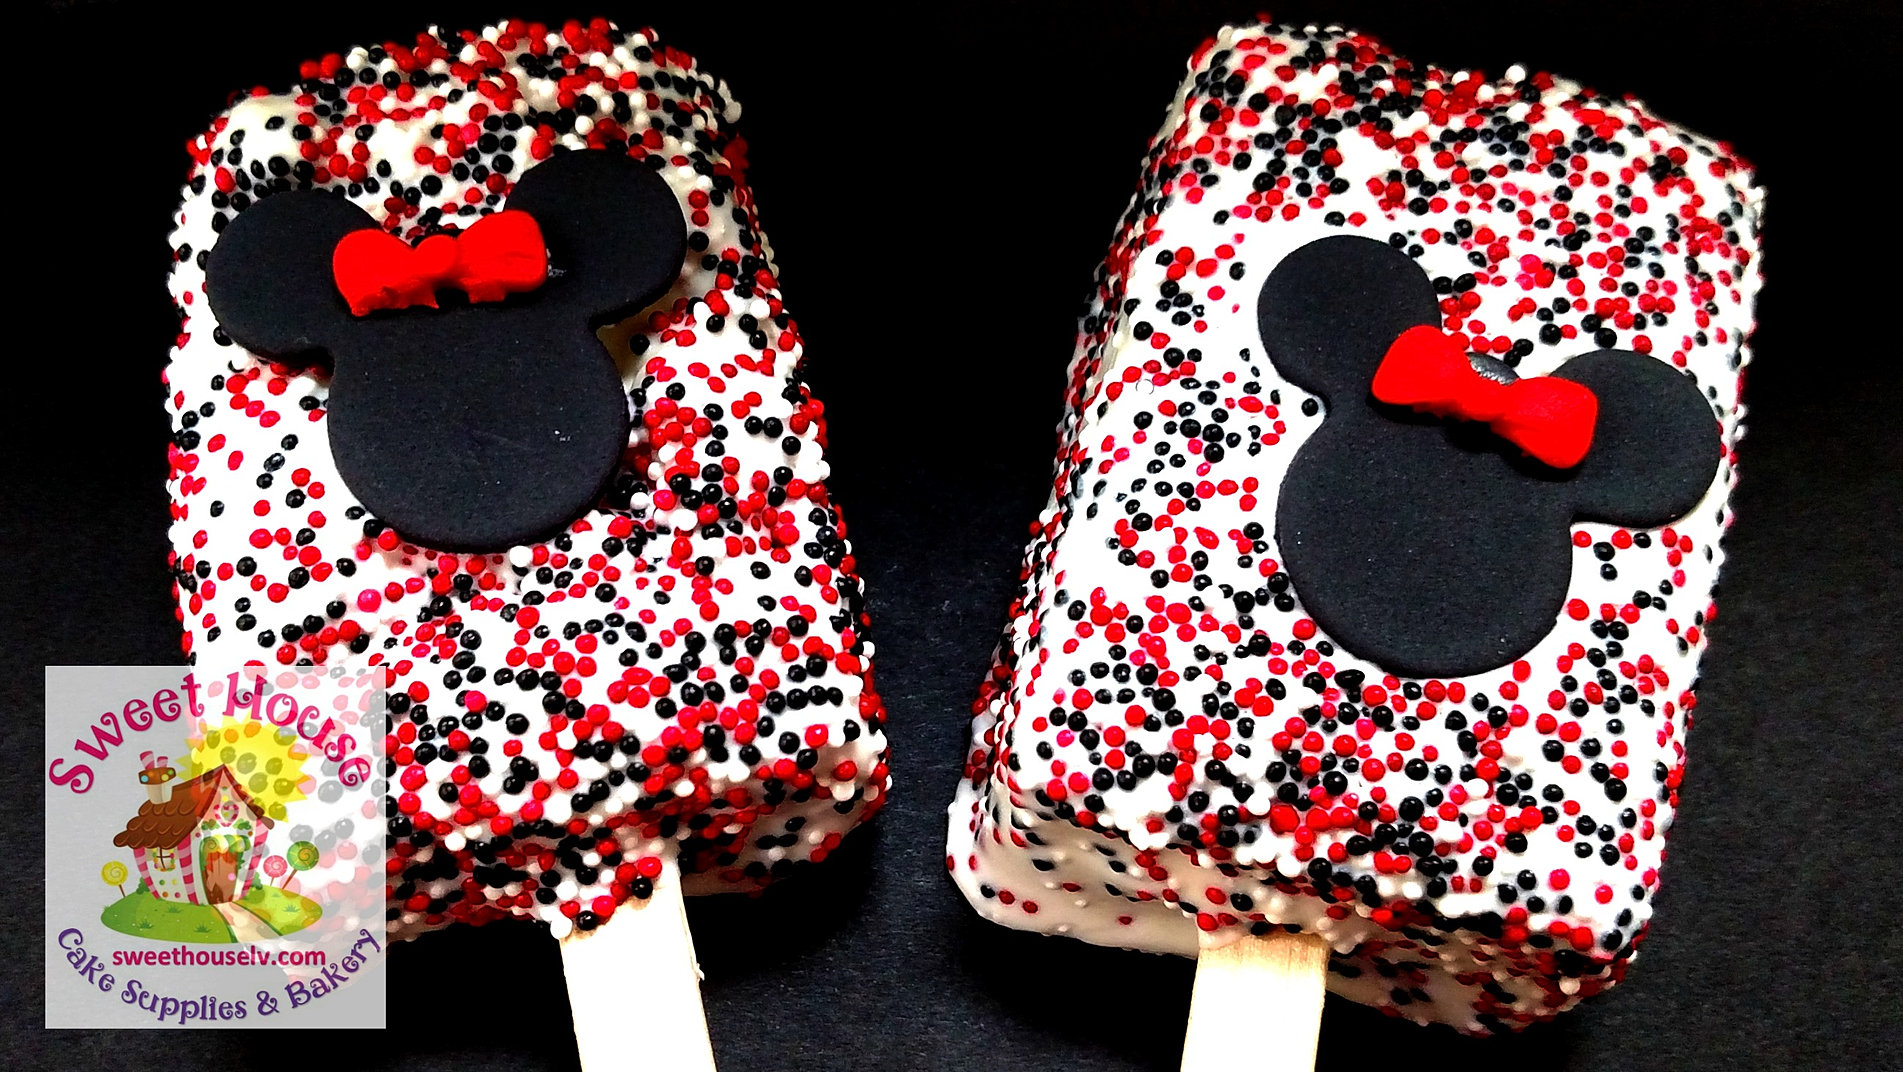 Home handmade candies chocolate dipped rice krispy treats 2 - Minnie Rice Krispie Treats